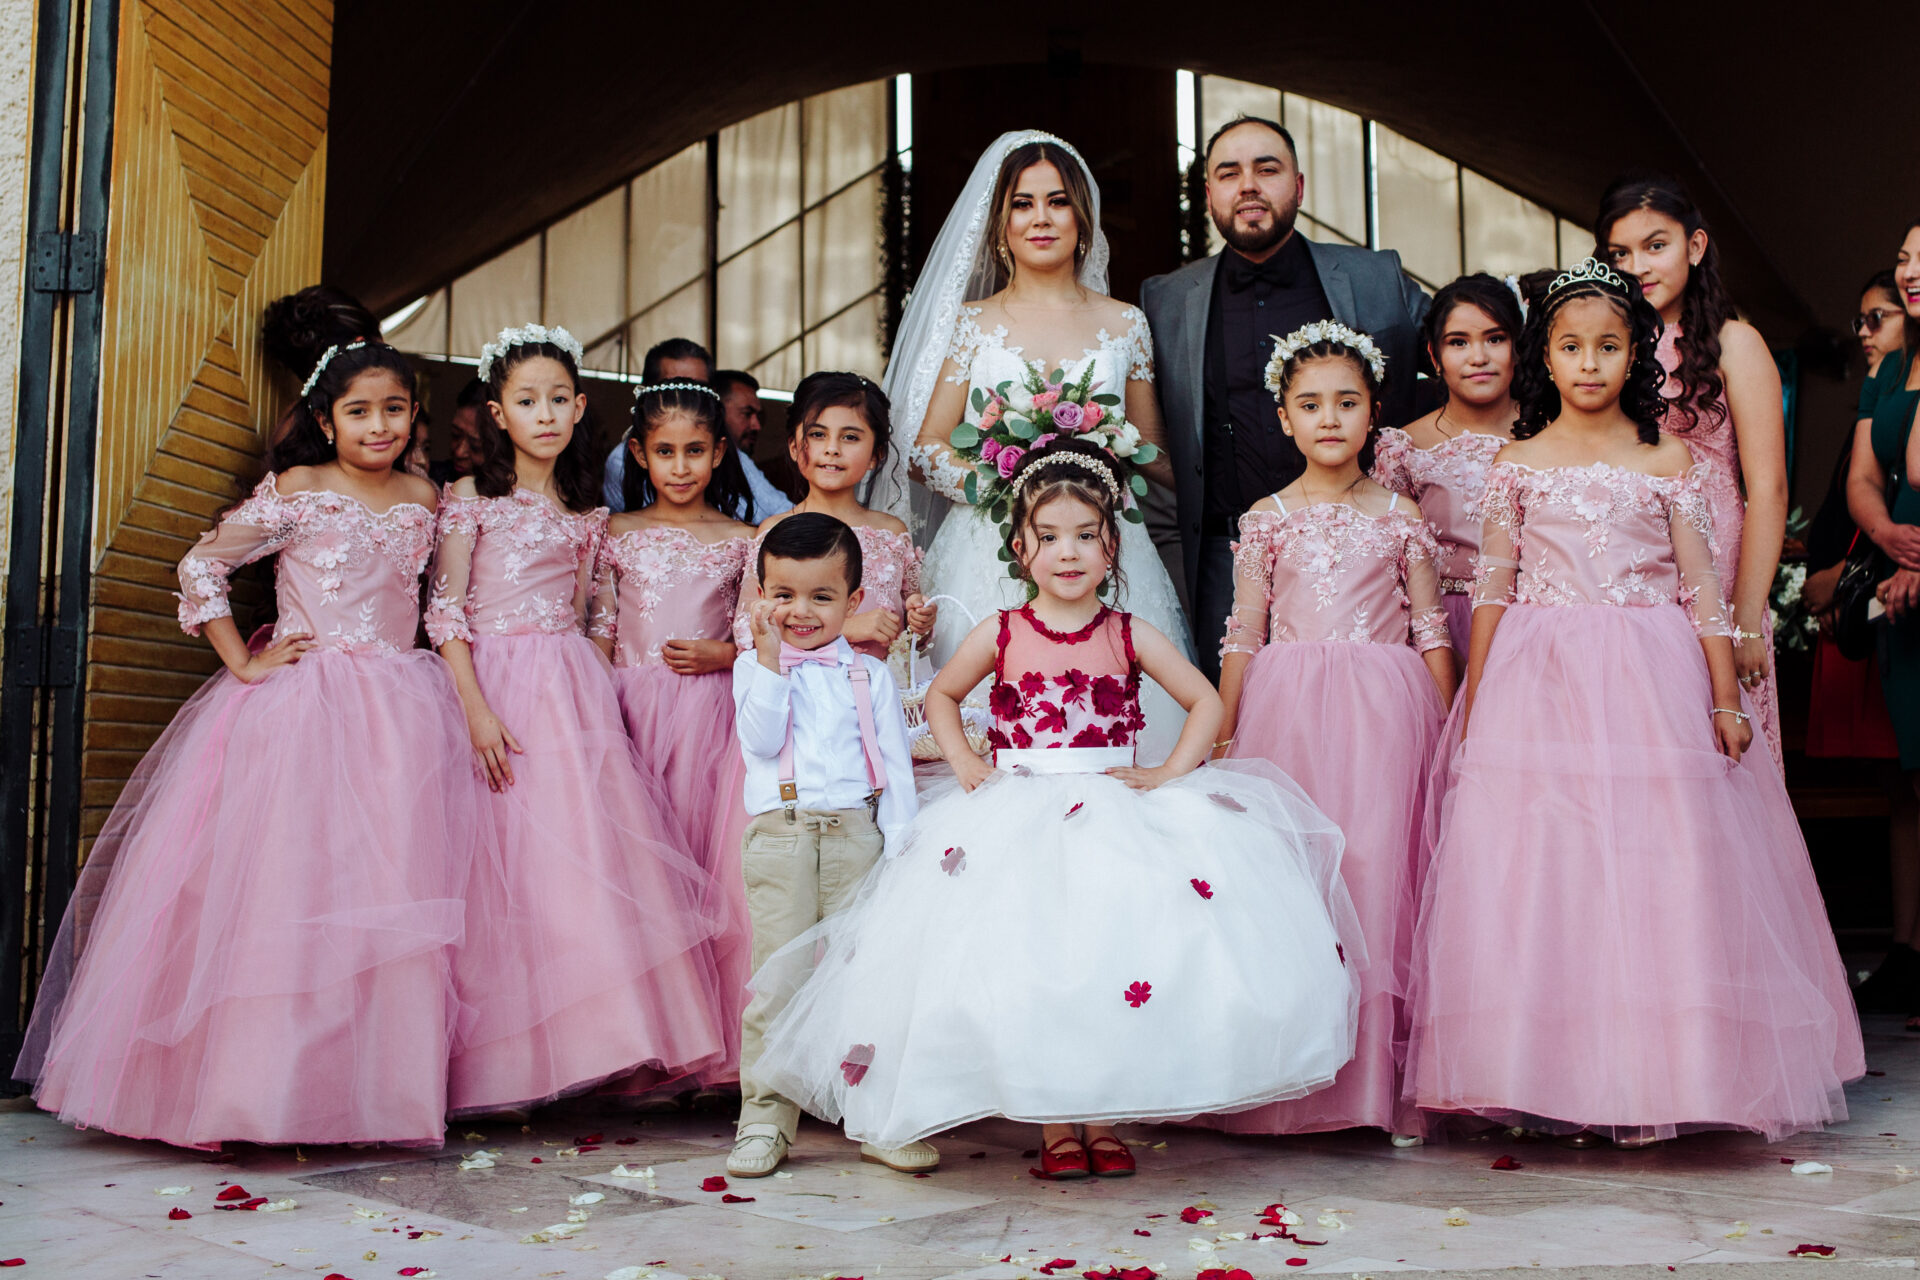 javier_noriega_fotografo_bodas_zacatecas_fresnillo_chihuahua_wedding_photographer8